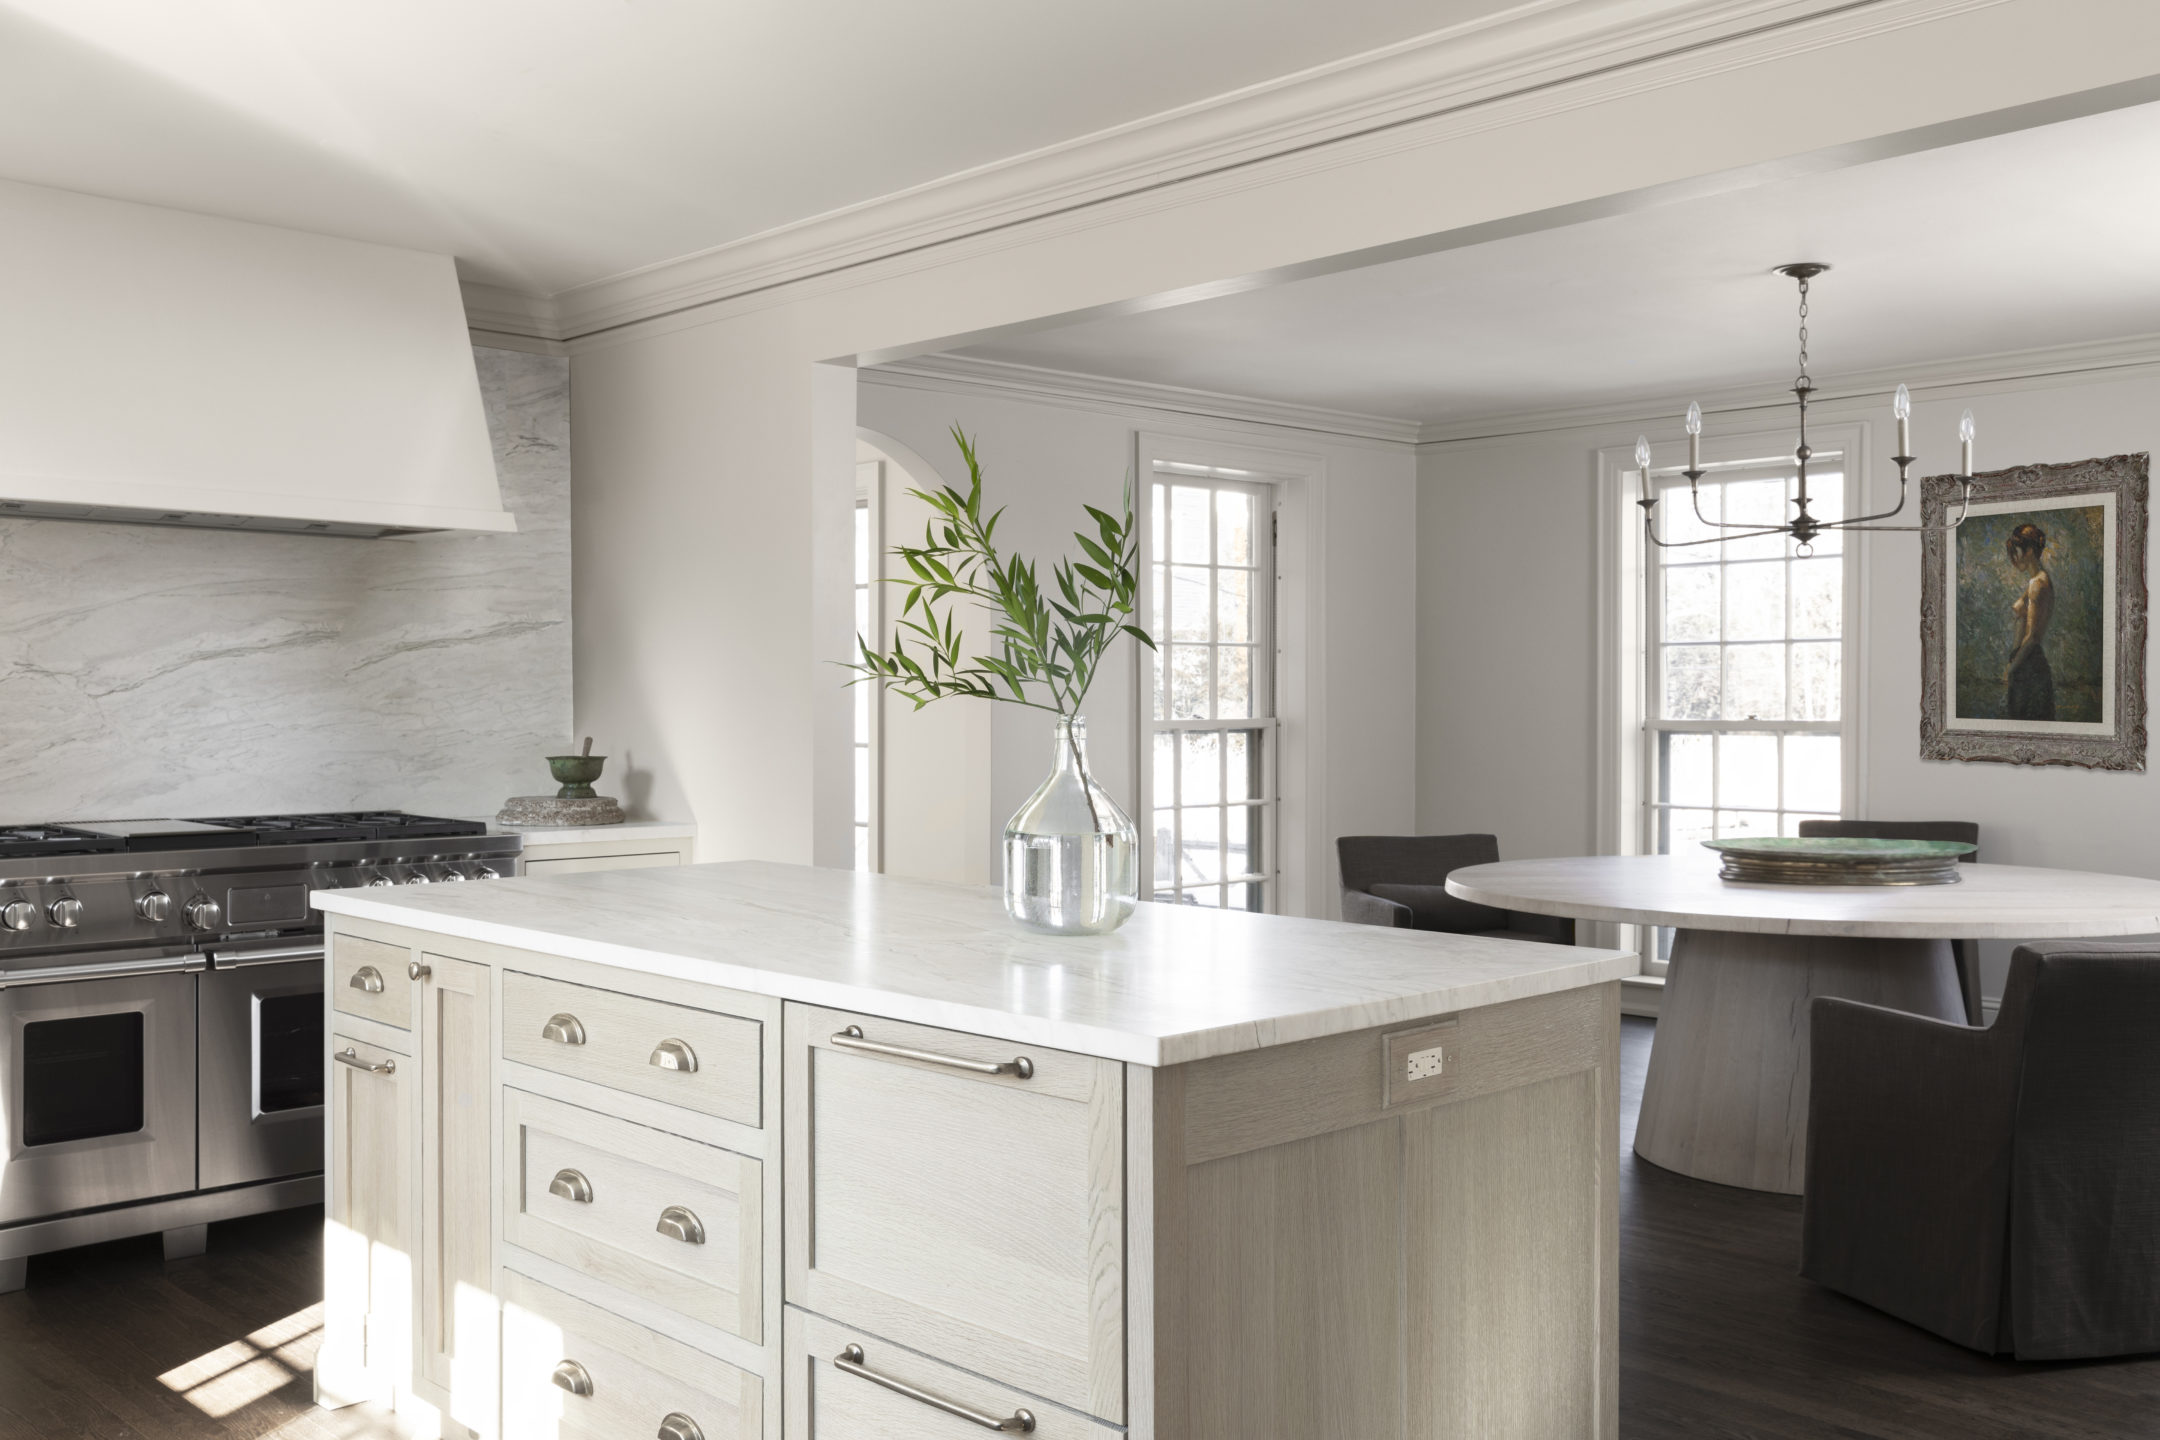 06 - Kitchen & Dining Room